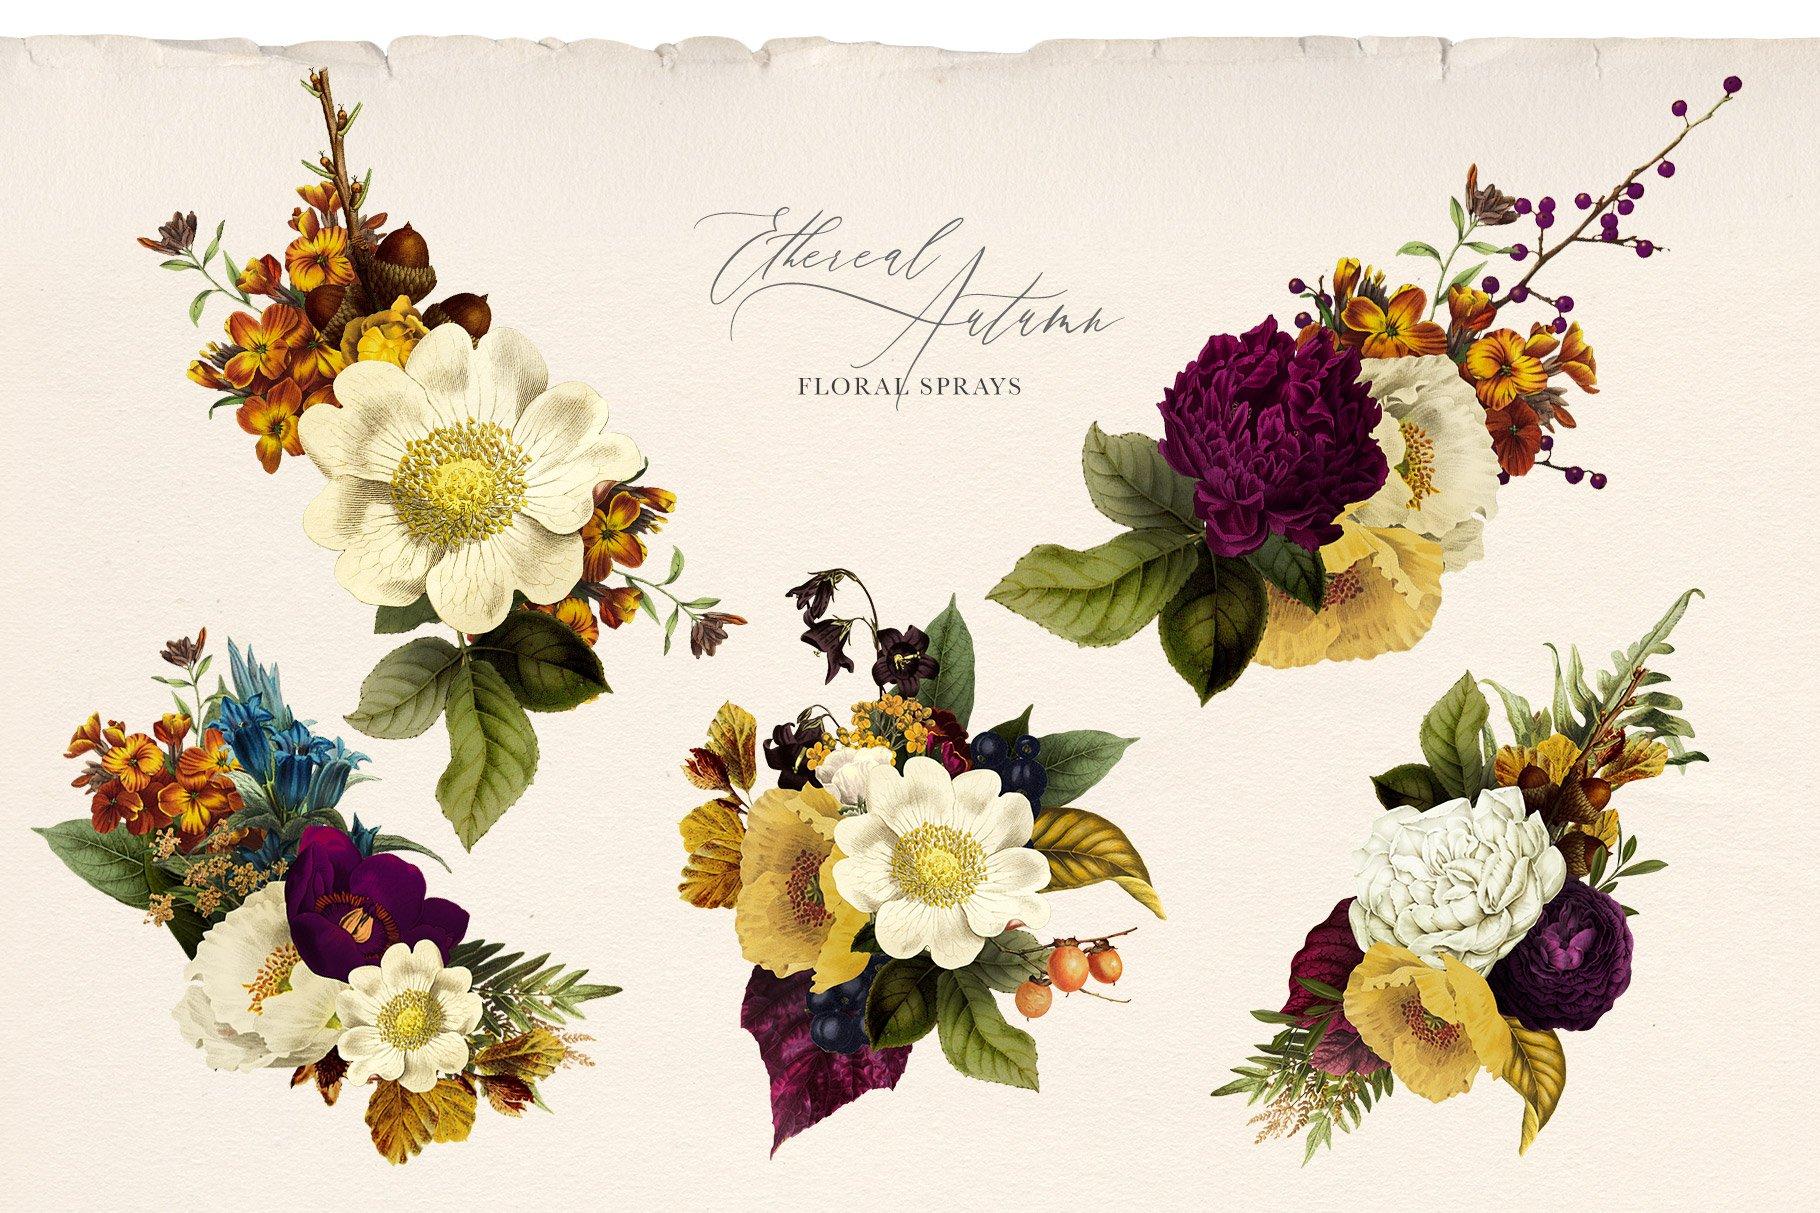 35款高清复古植物花卉平面广告背景设计PNG免抠图片素材 Ethereal Autumn Floral Bouquets插图(7)